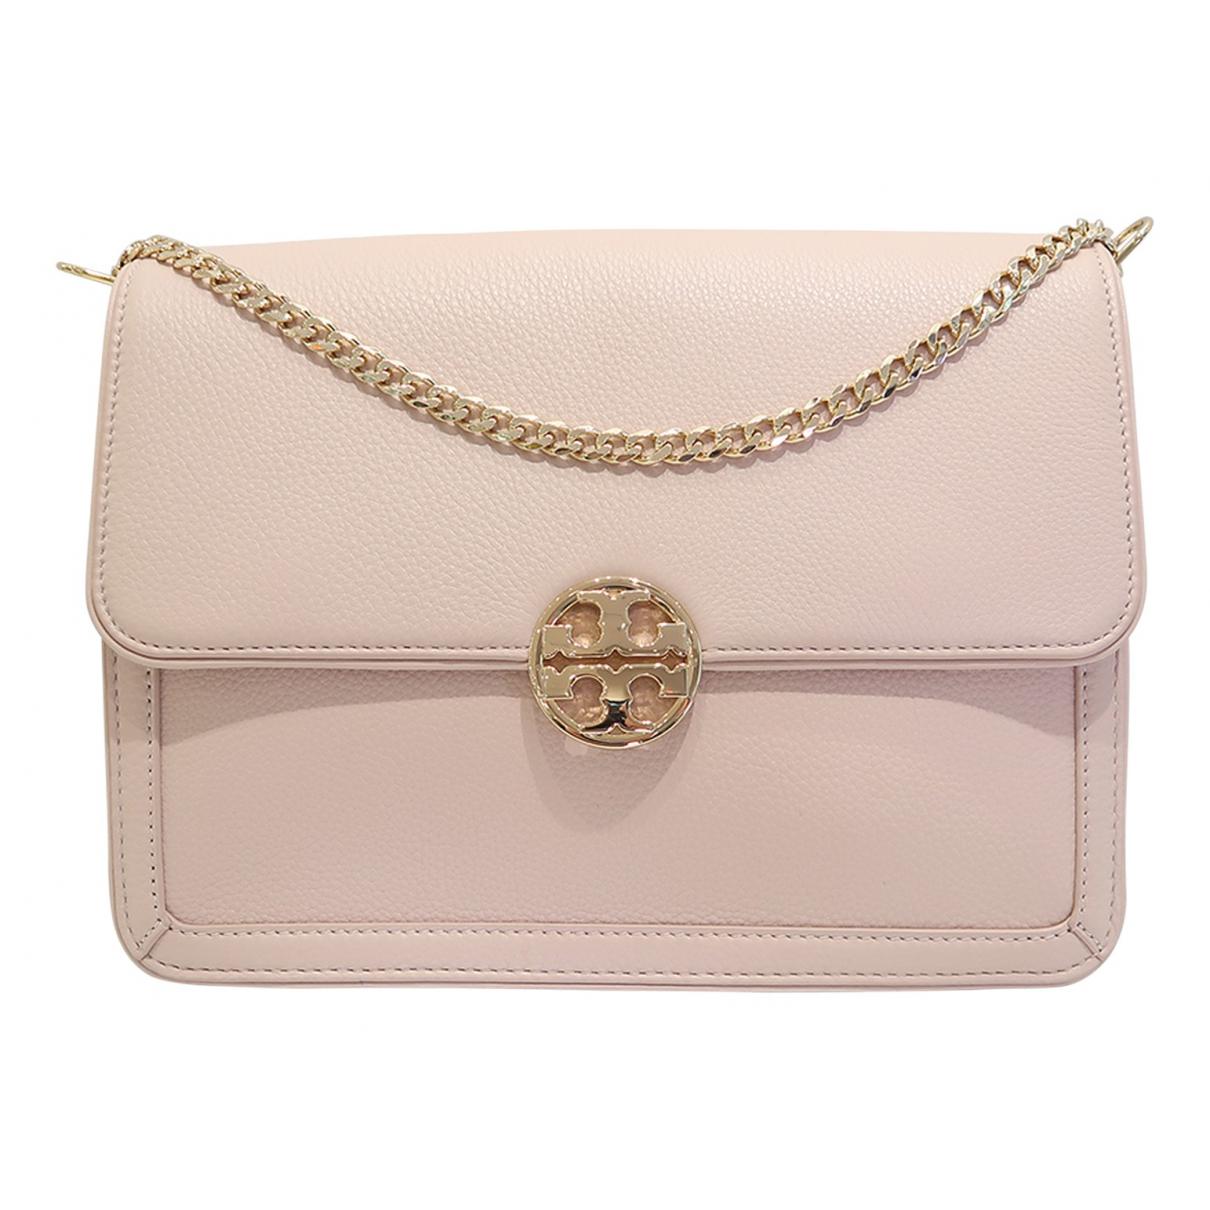 Tory Burch N Pink Leather handbag for Women N